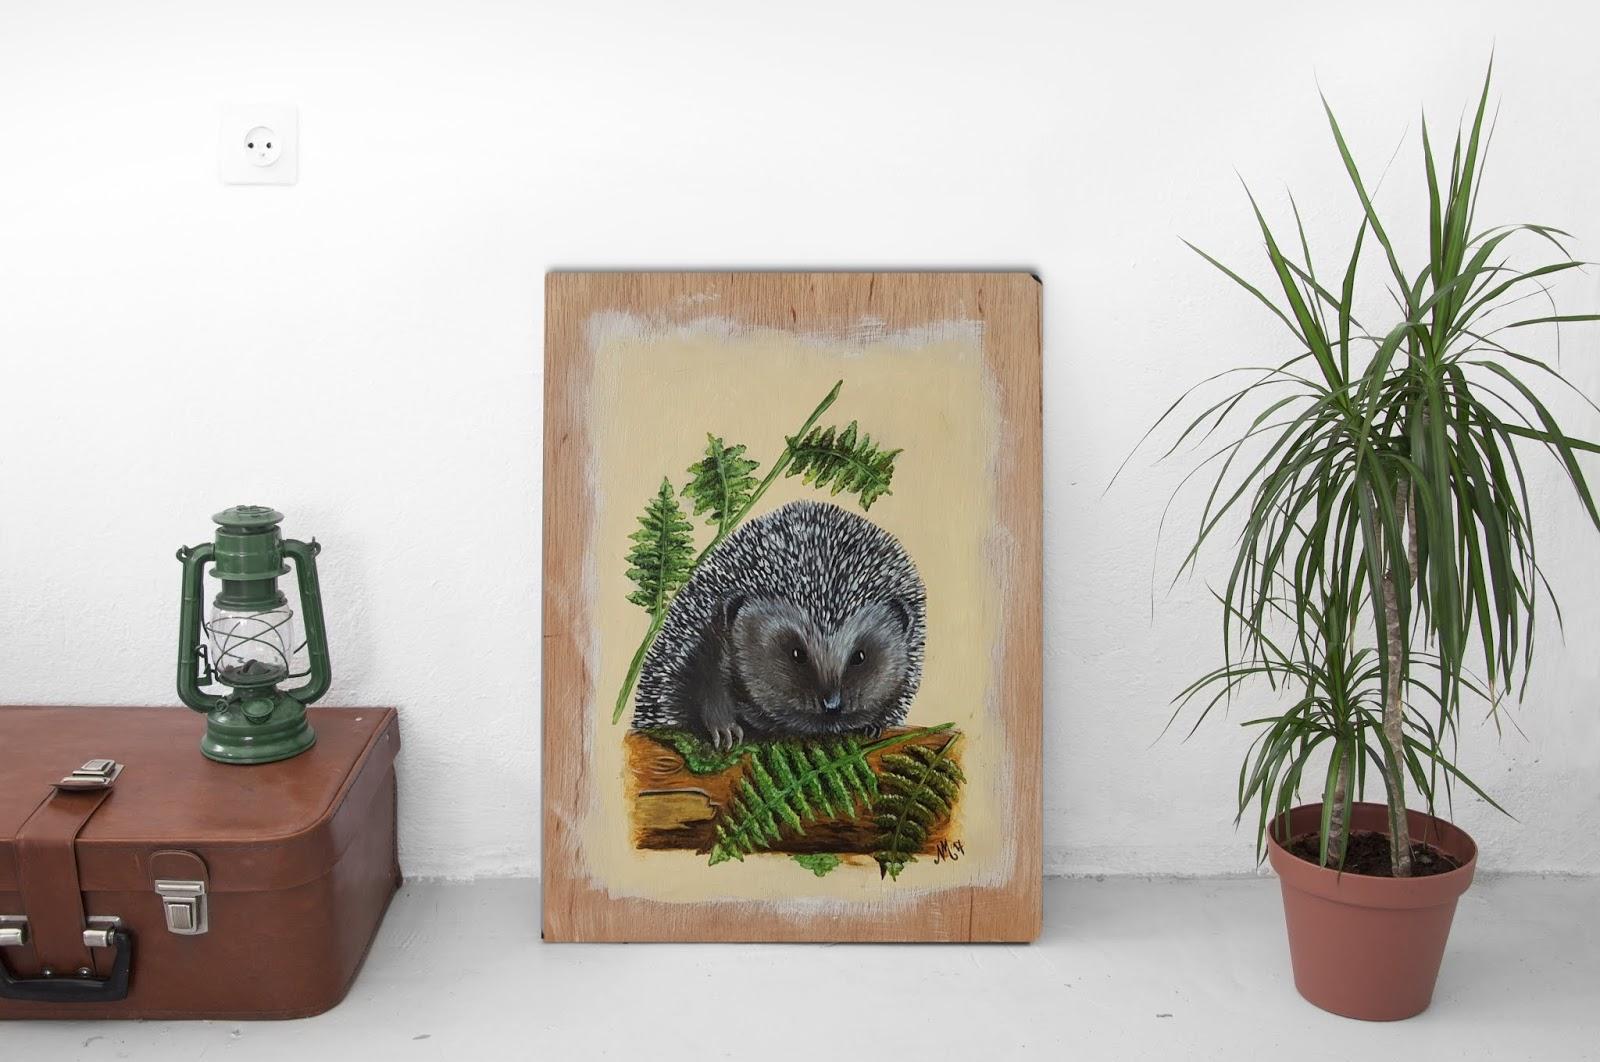 The Doodling Dutchie Woodland Life Hedgehog Hello